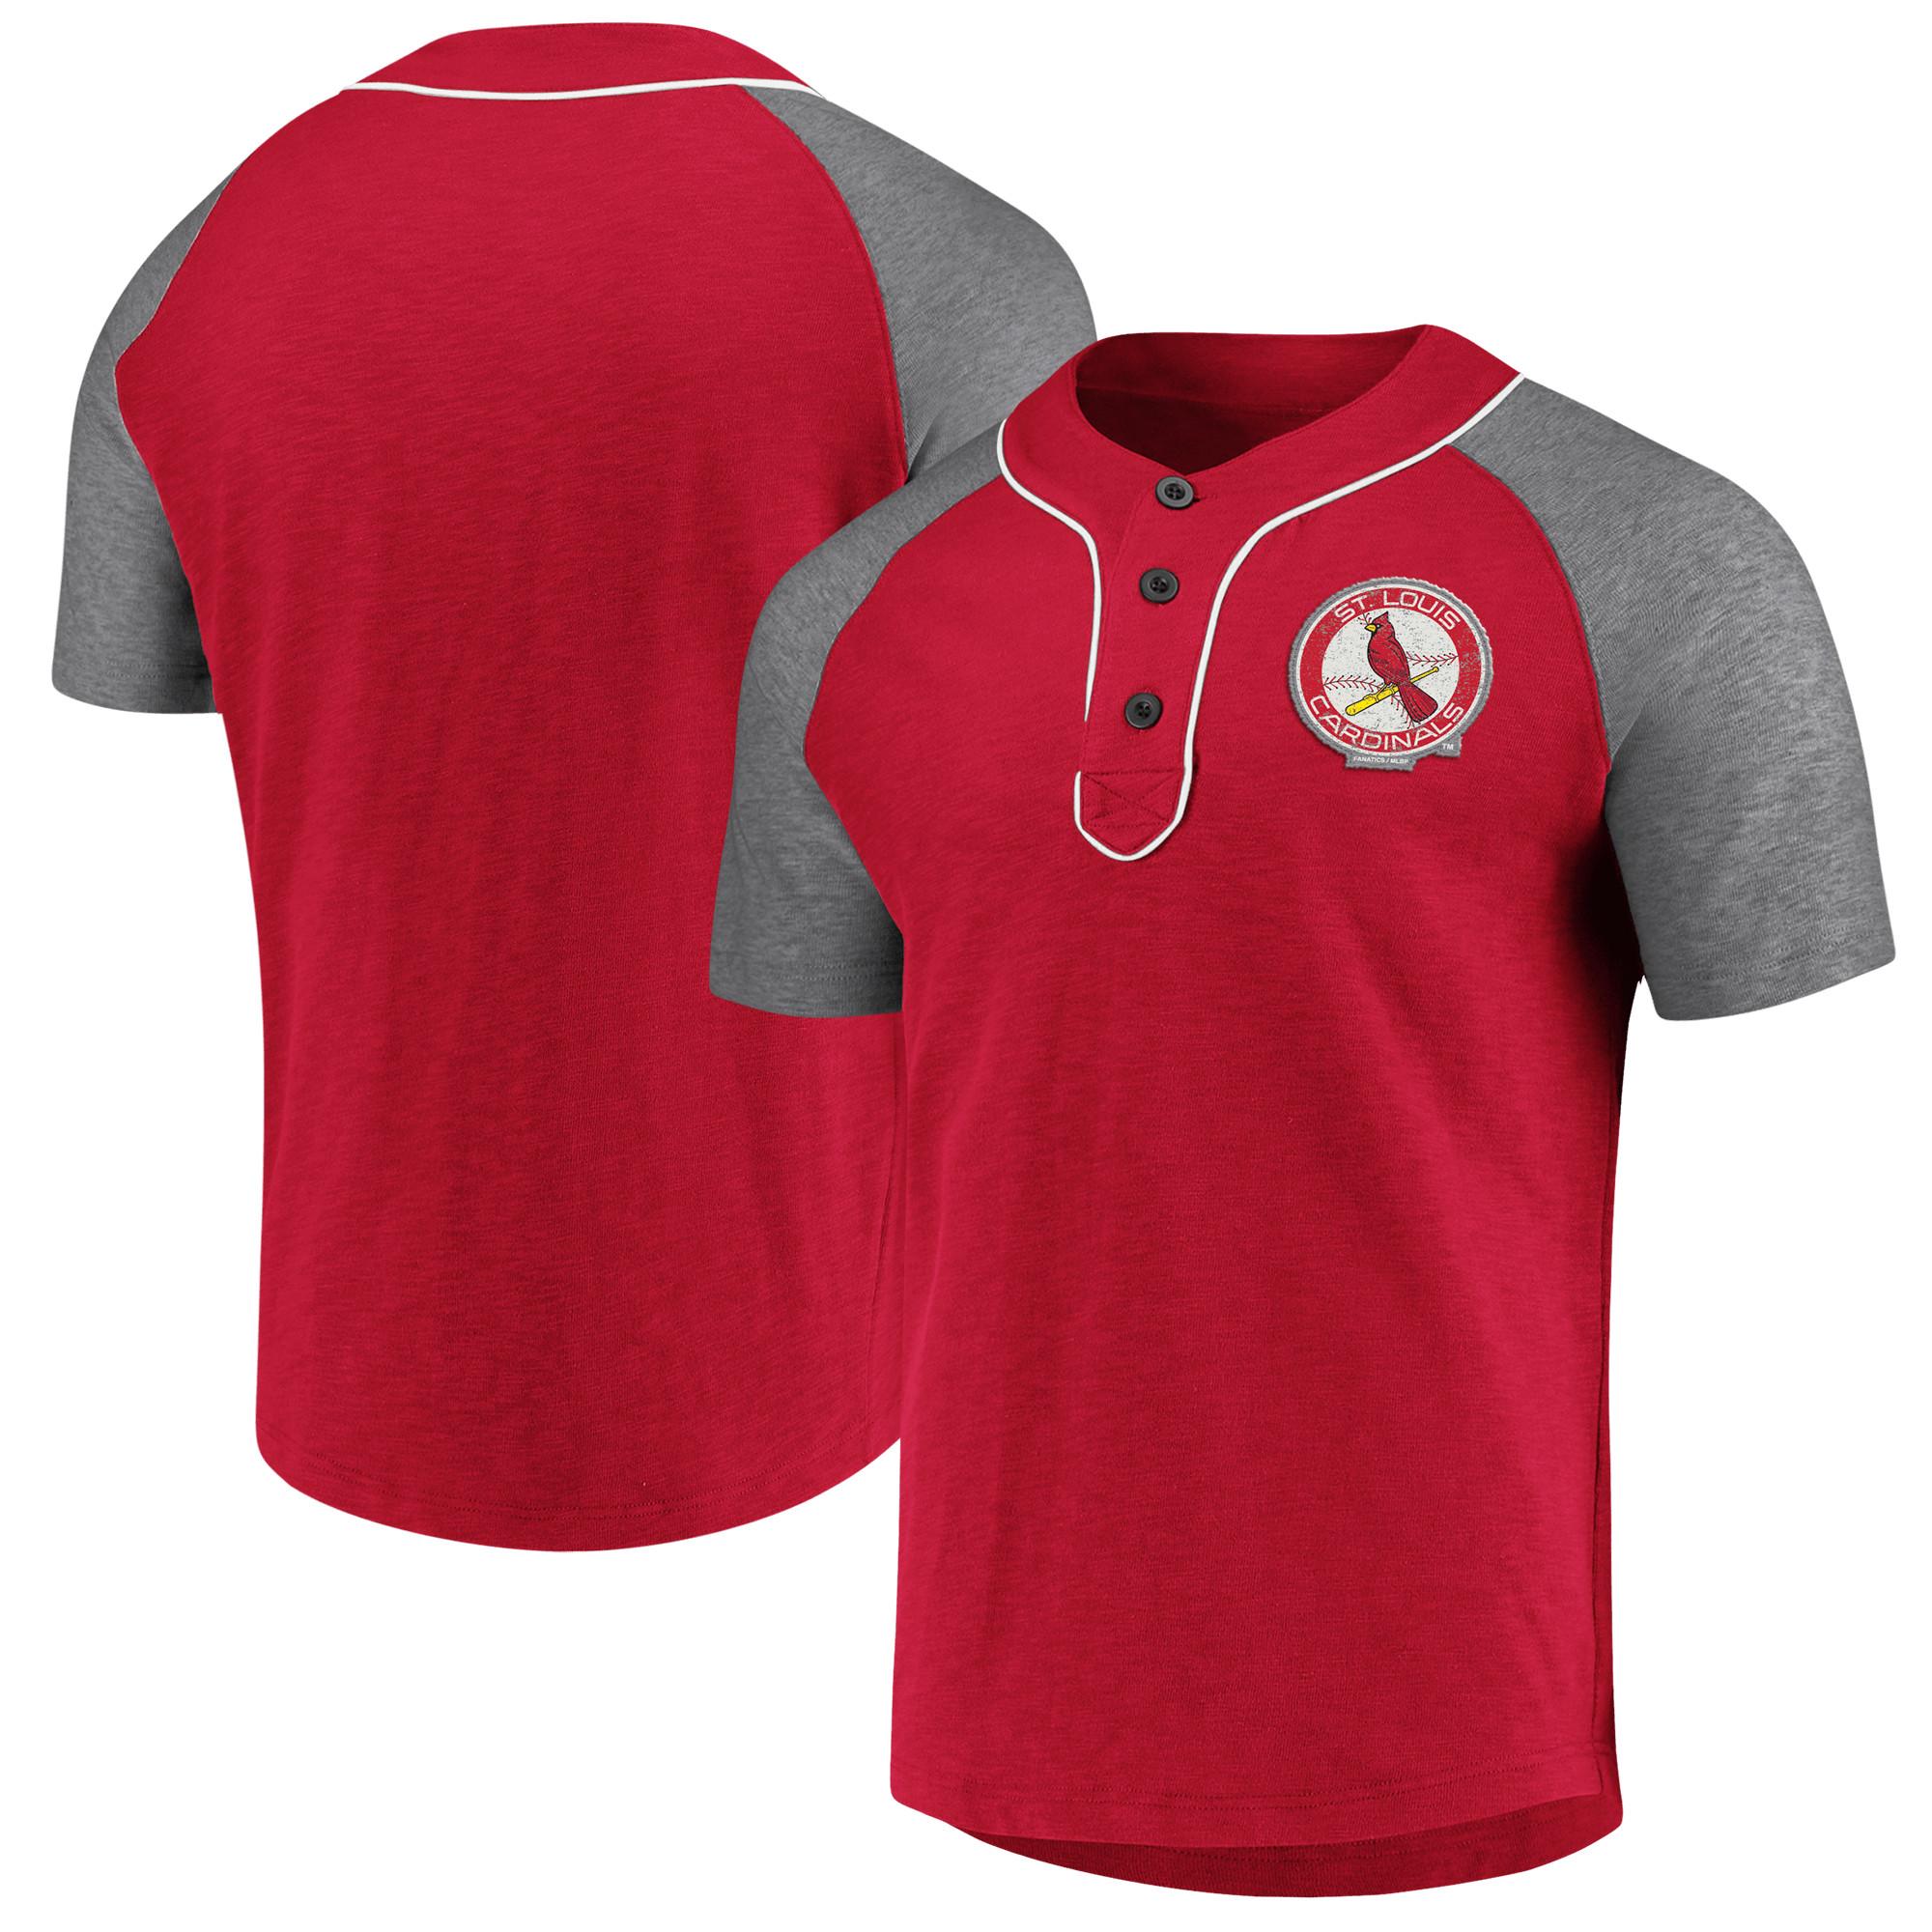 St. Louis Cardinals Fanatics Branded MLB True Classics Henley T-Shirt - Red/Gray